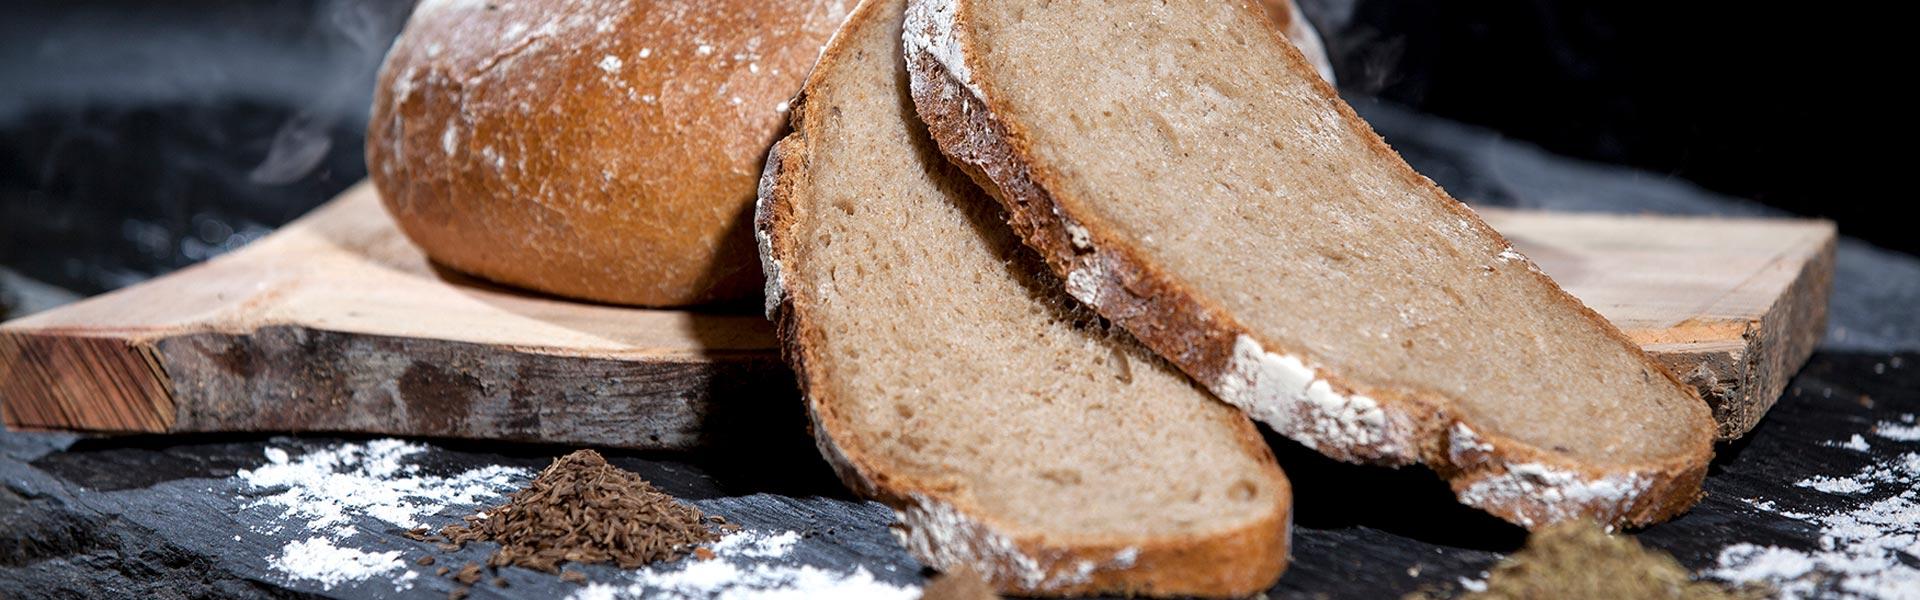 Bäckerei | Konditorei Margreiter | Kundl Tirol | home